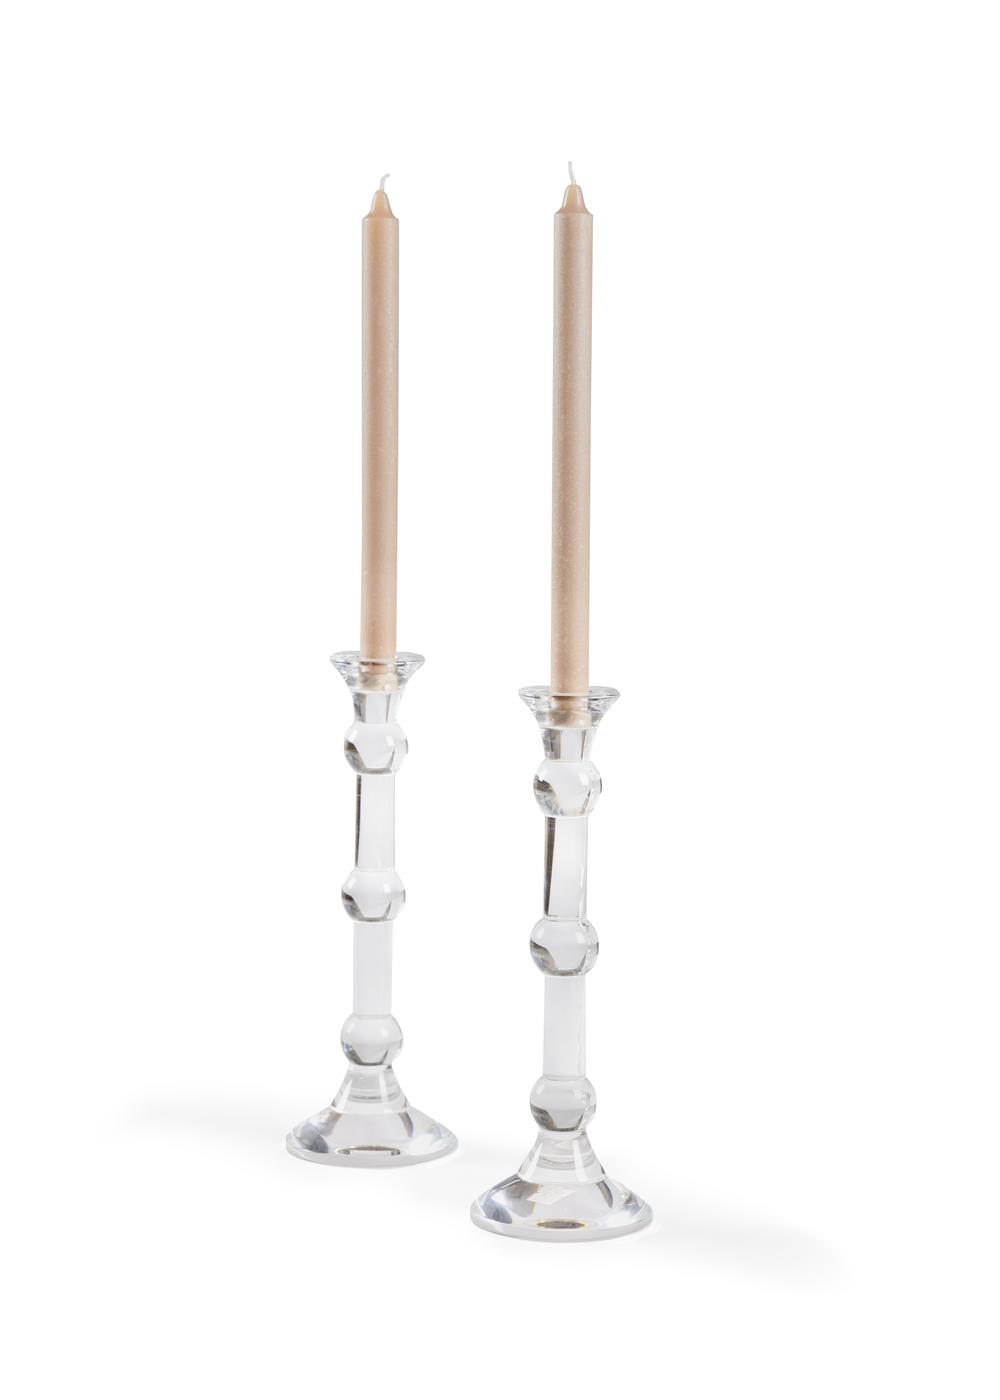 Chelsea House - Gleason Candlesticks, Pair